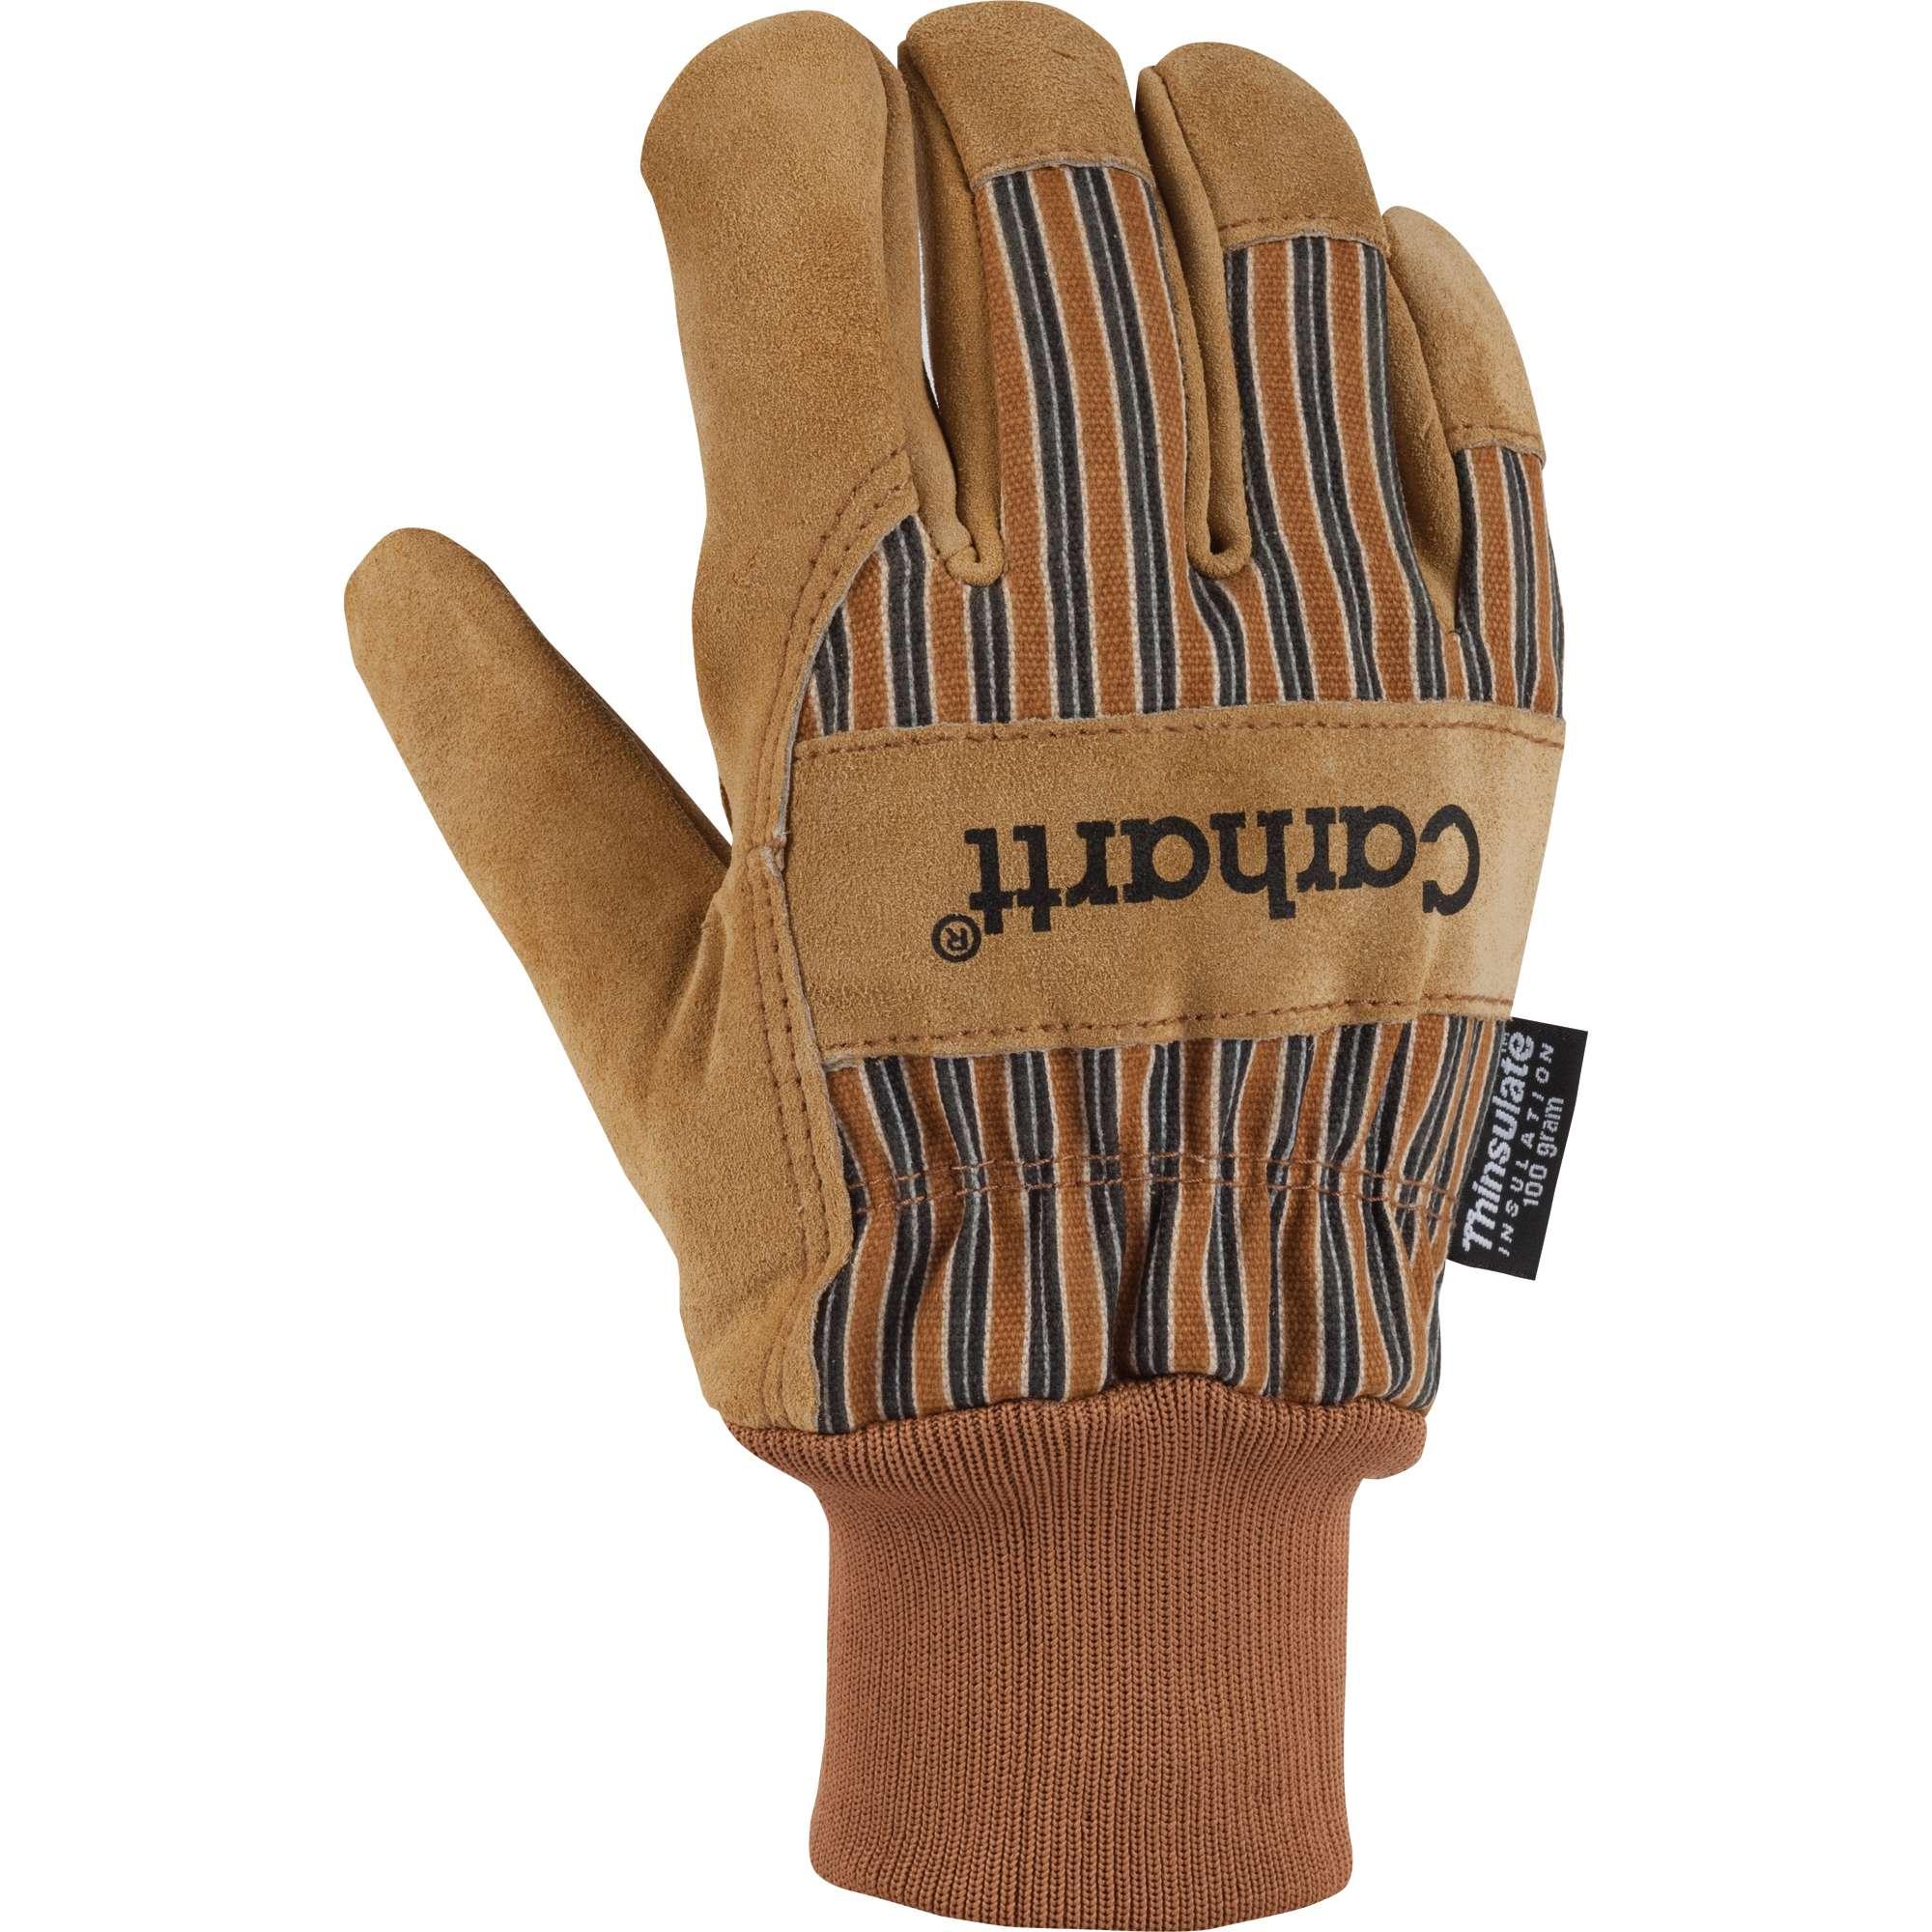 Carhartt Insulated Suede Knit Cuff Work Glove